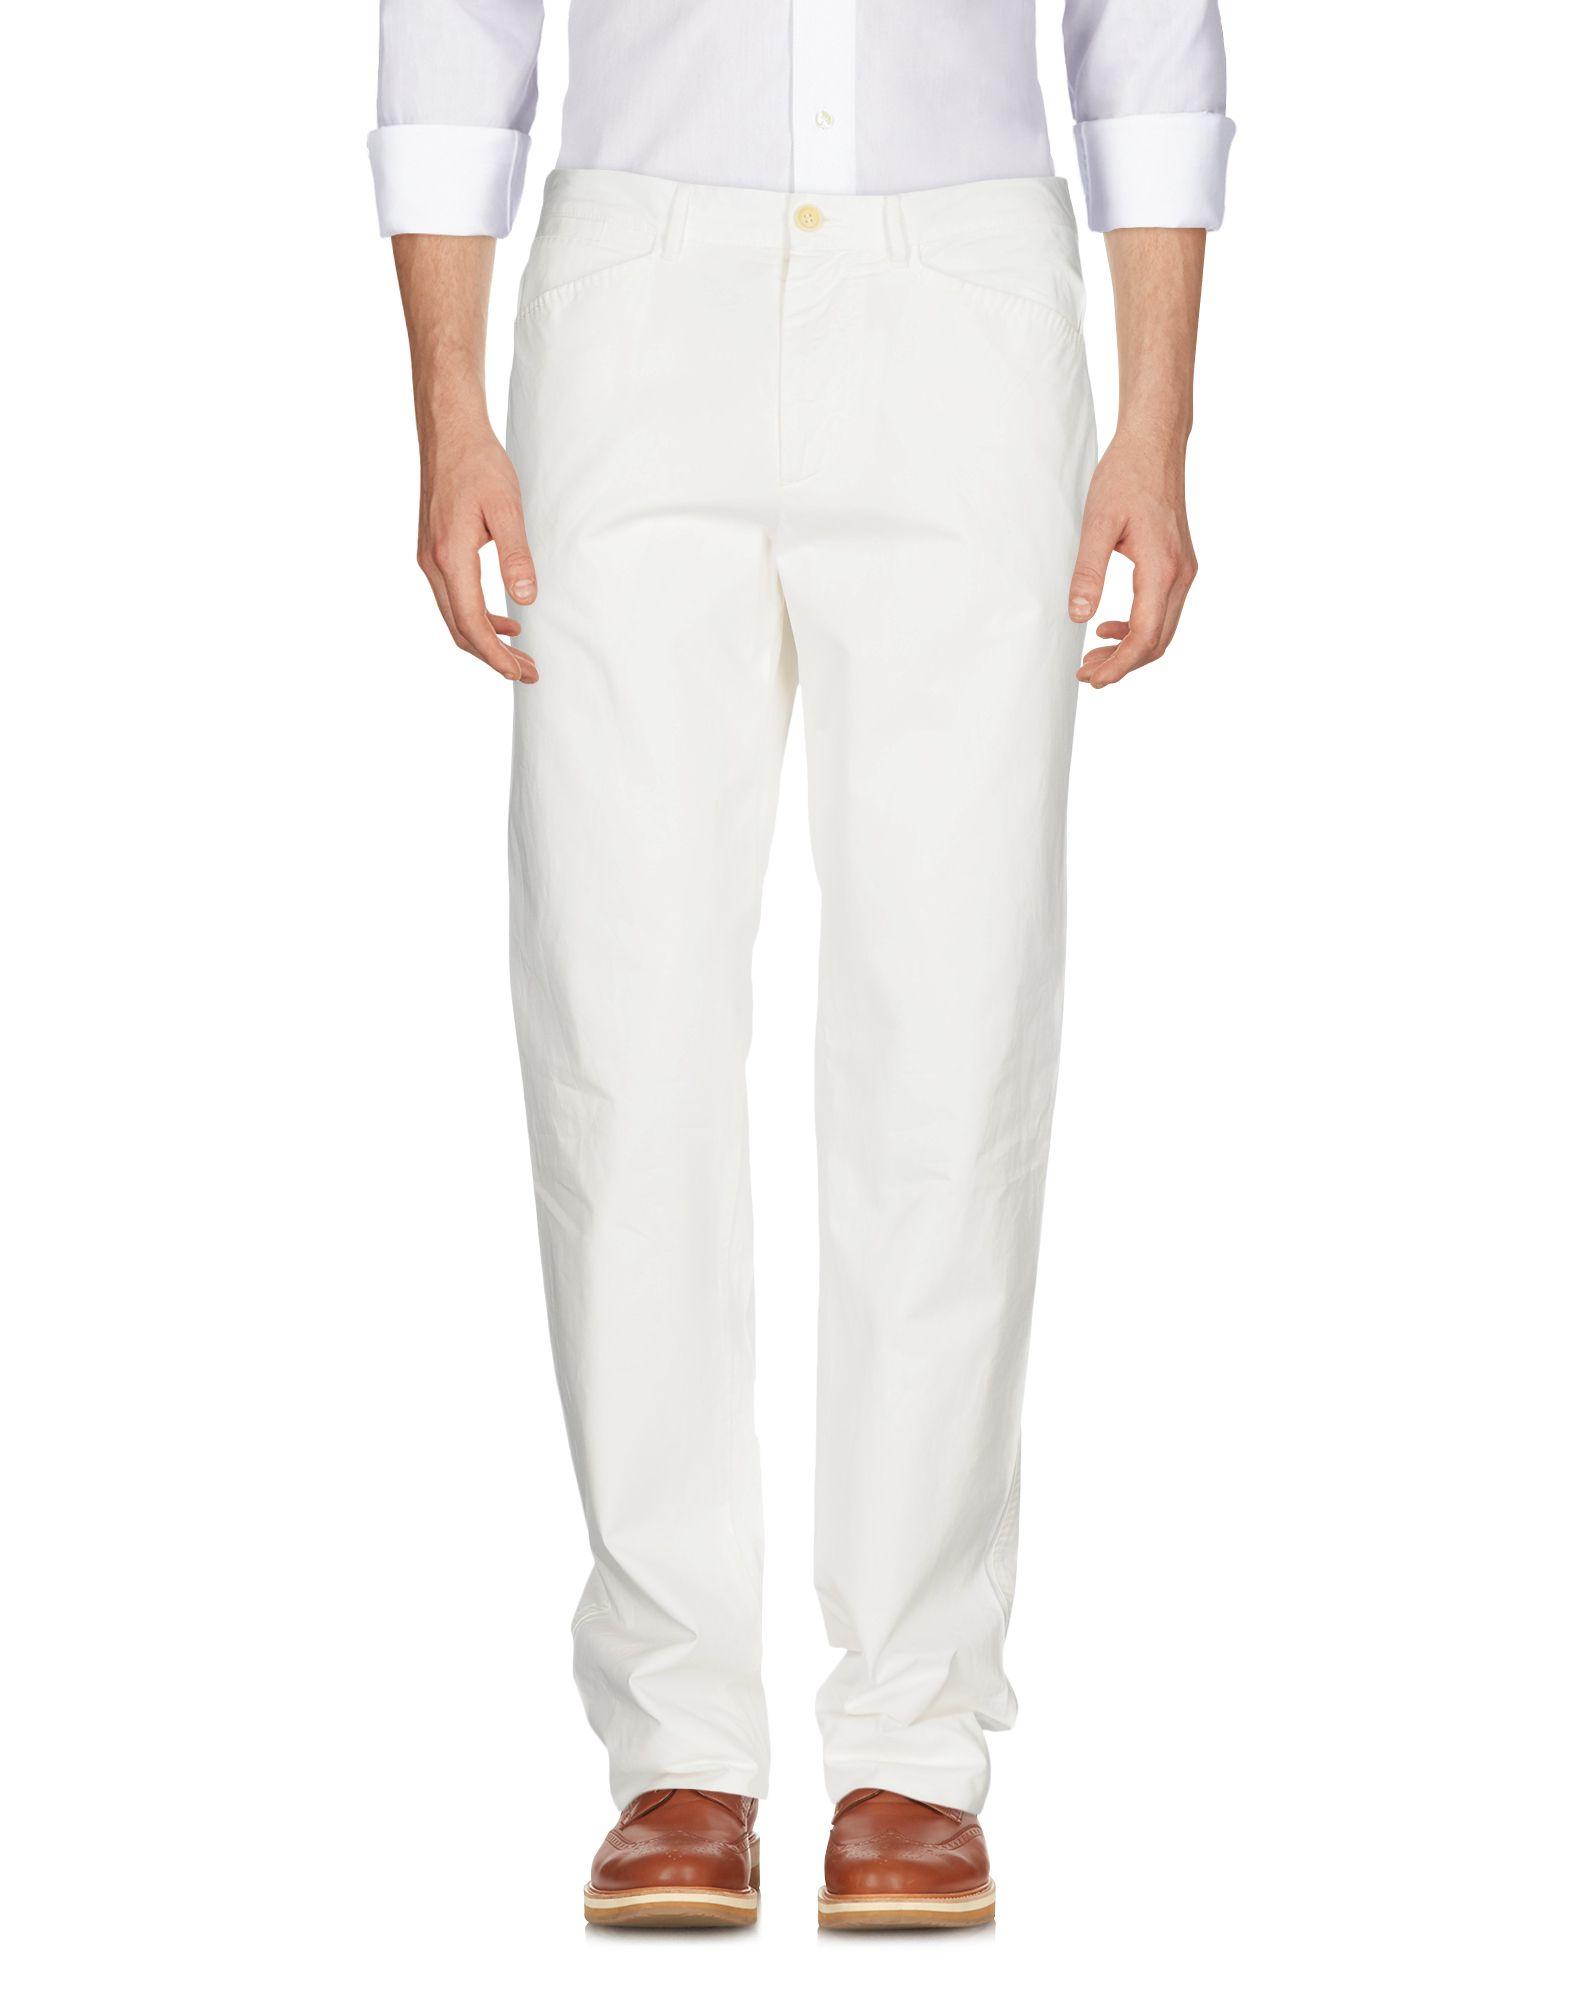 MARINA YACHTING Повседневные брюки блуза marina yachting b1 028 58626 00 65023 092